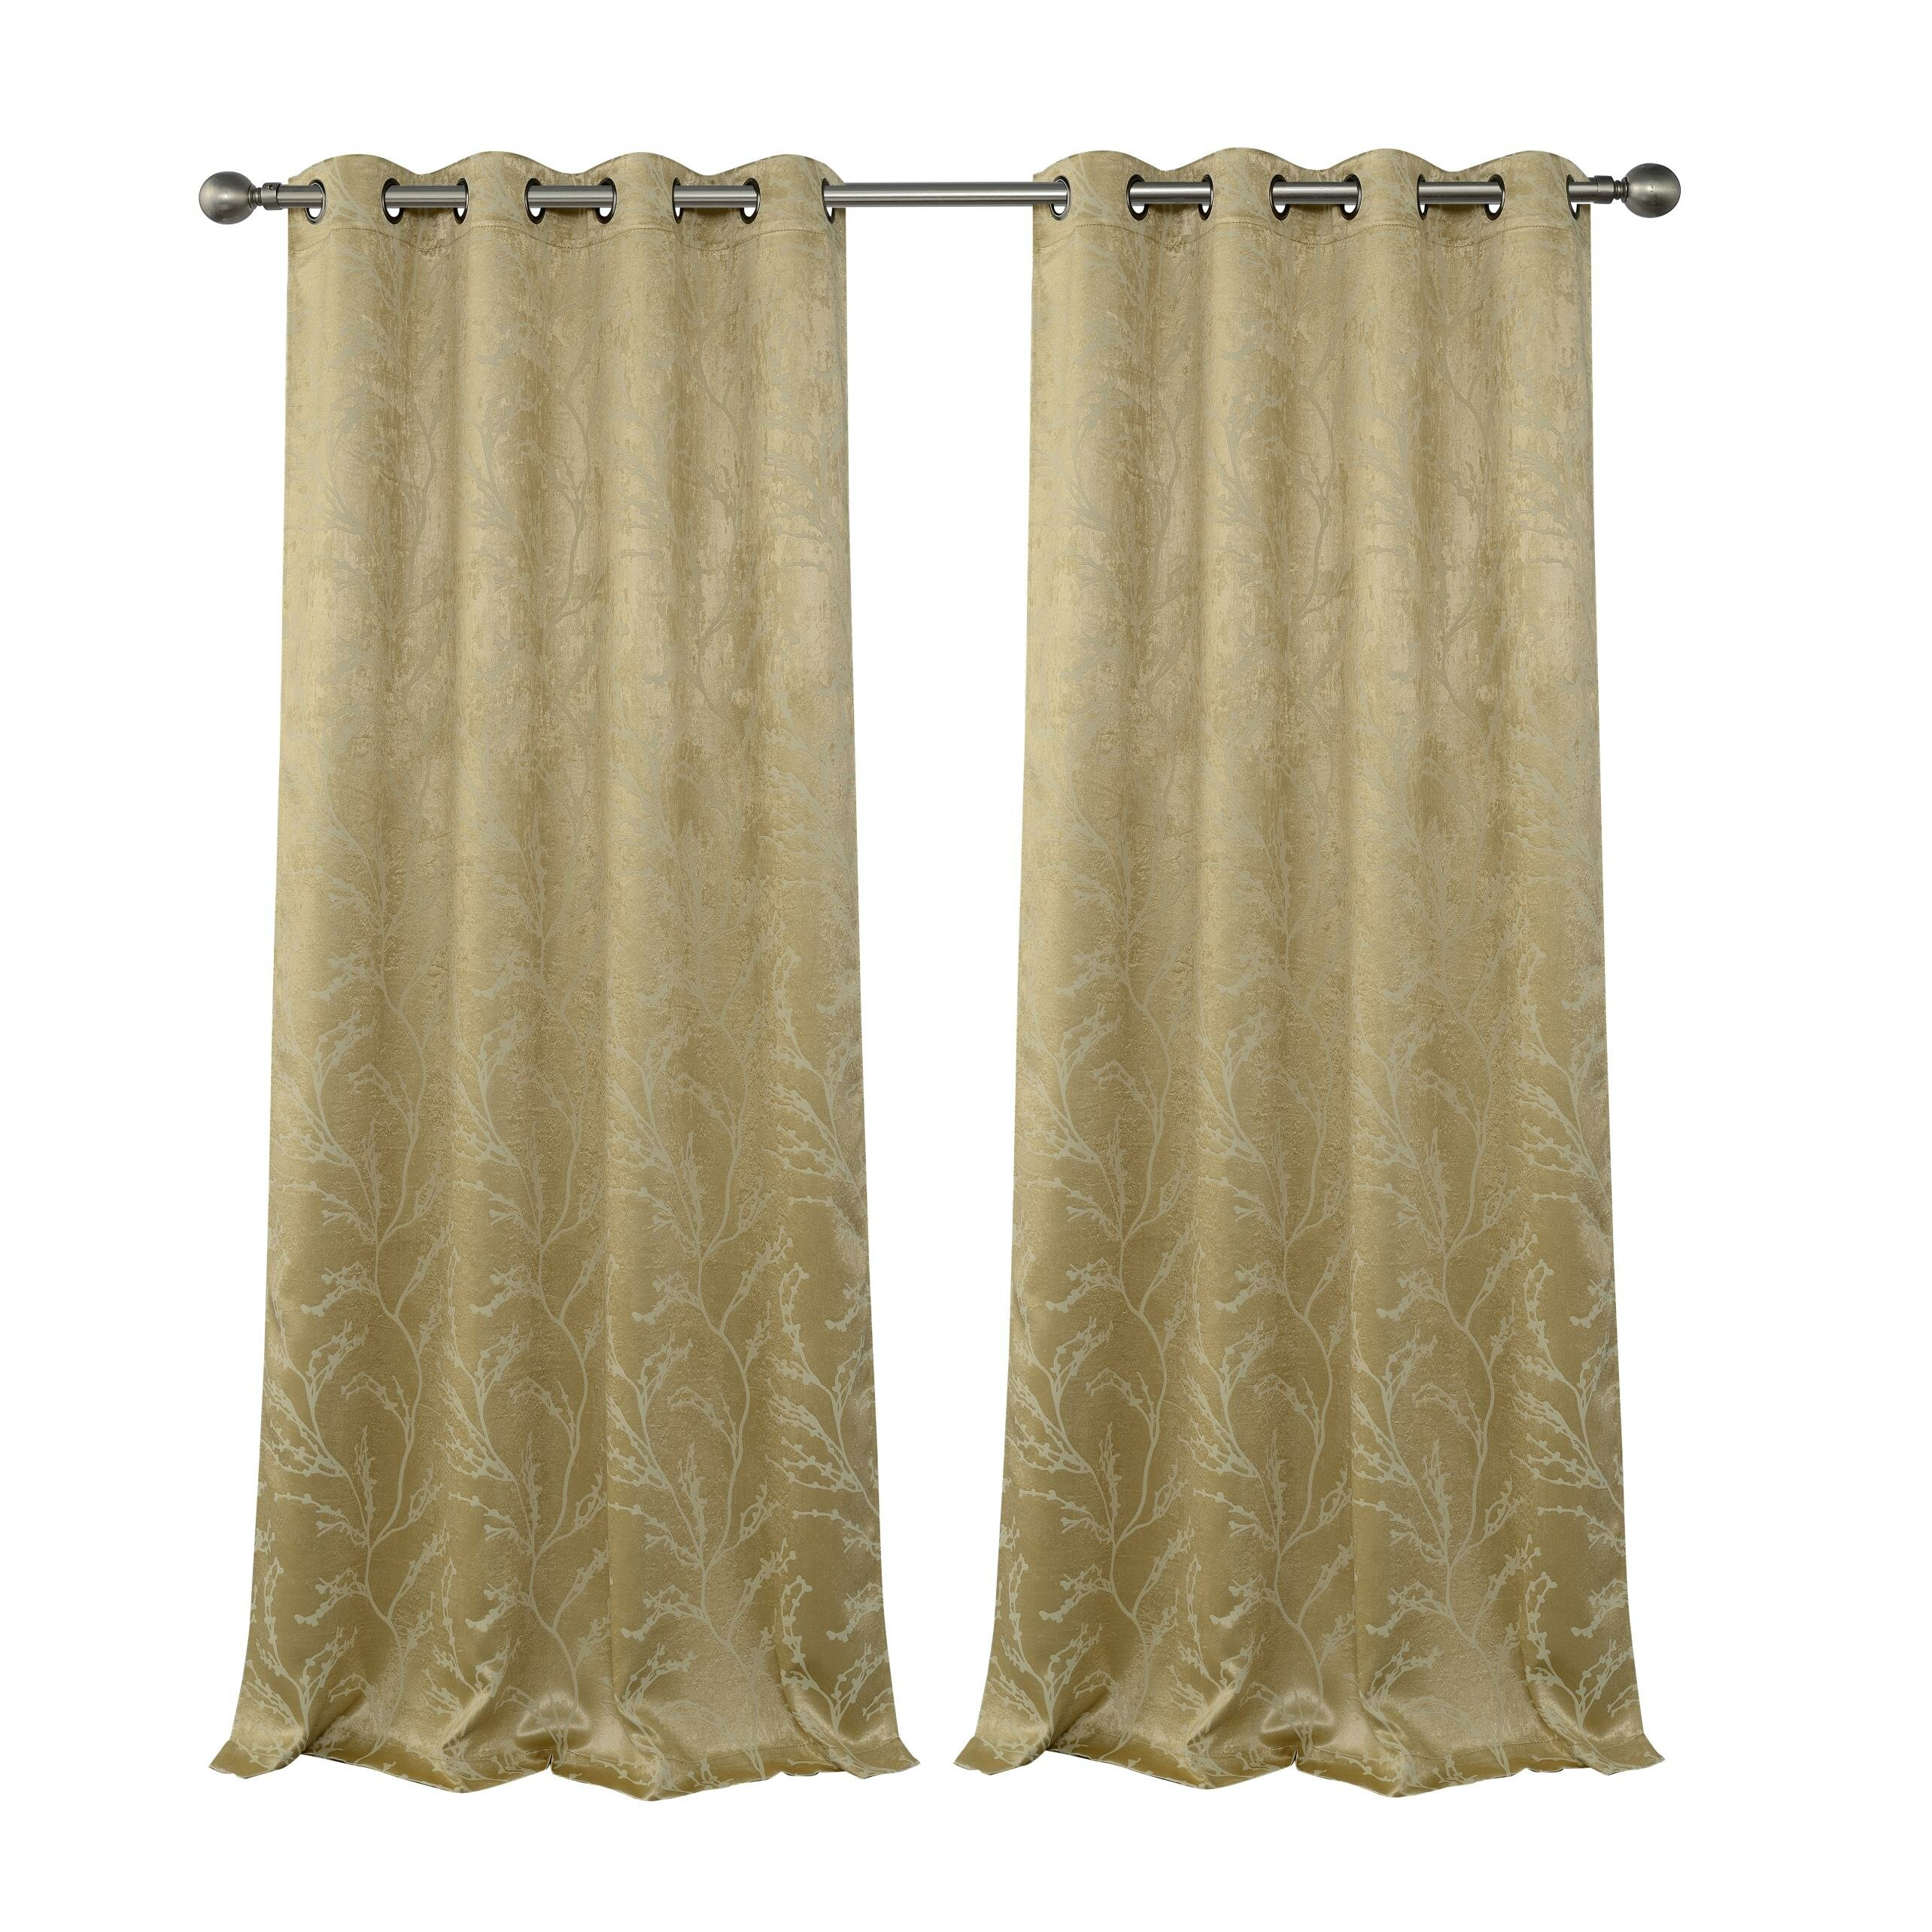 Inoue Reversible Top Floral Blackout Thermal Grommet Curtain Panels Inside Total Blackout Metallic Print Grommet Top Curtain Panels (View 24 of 36)